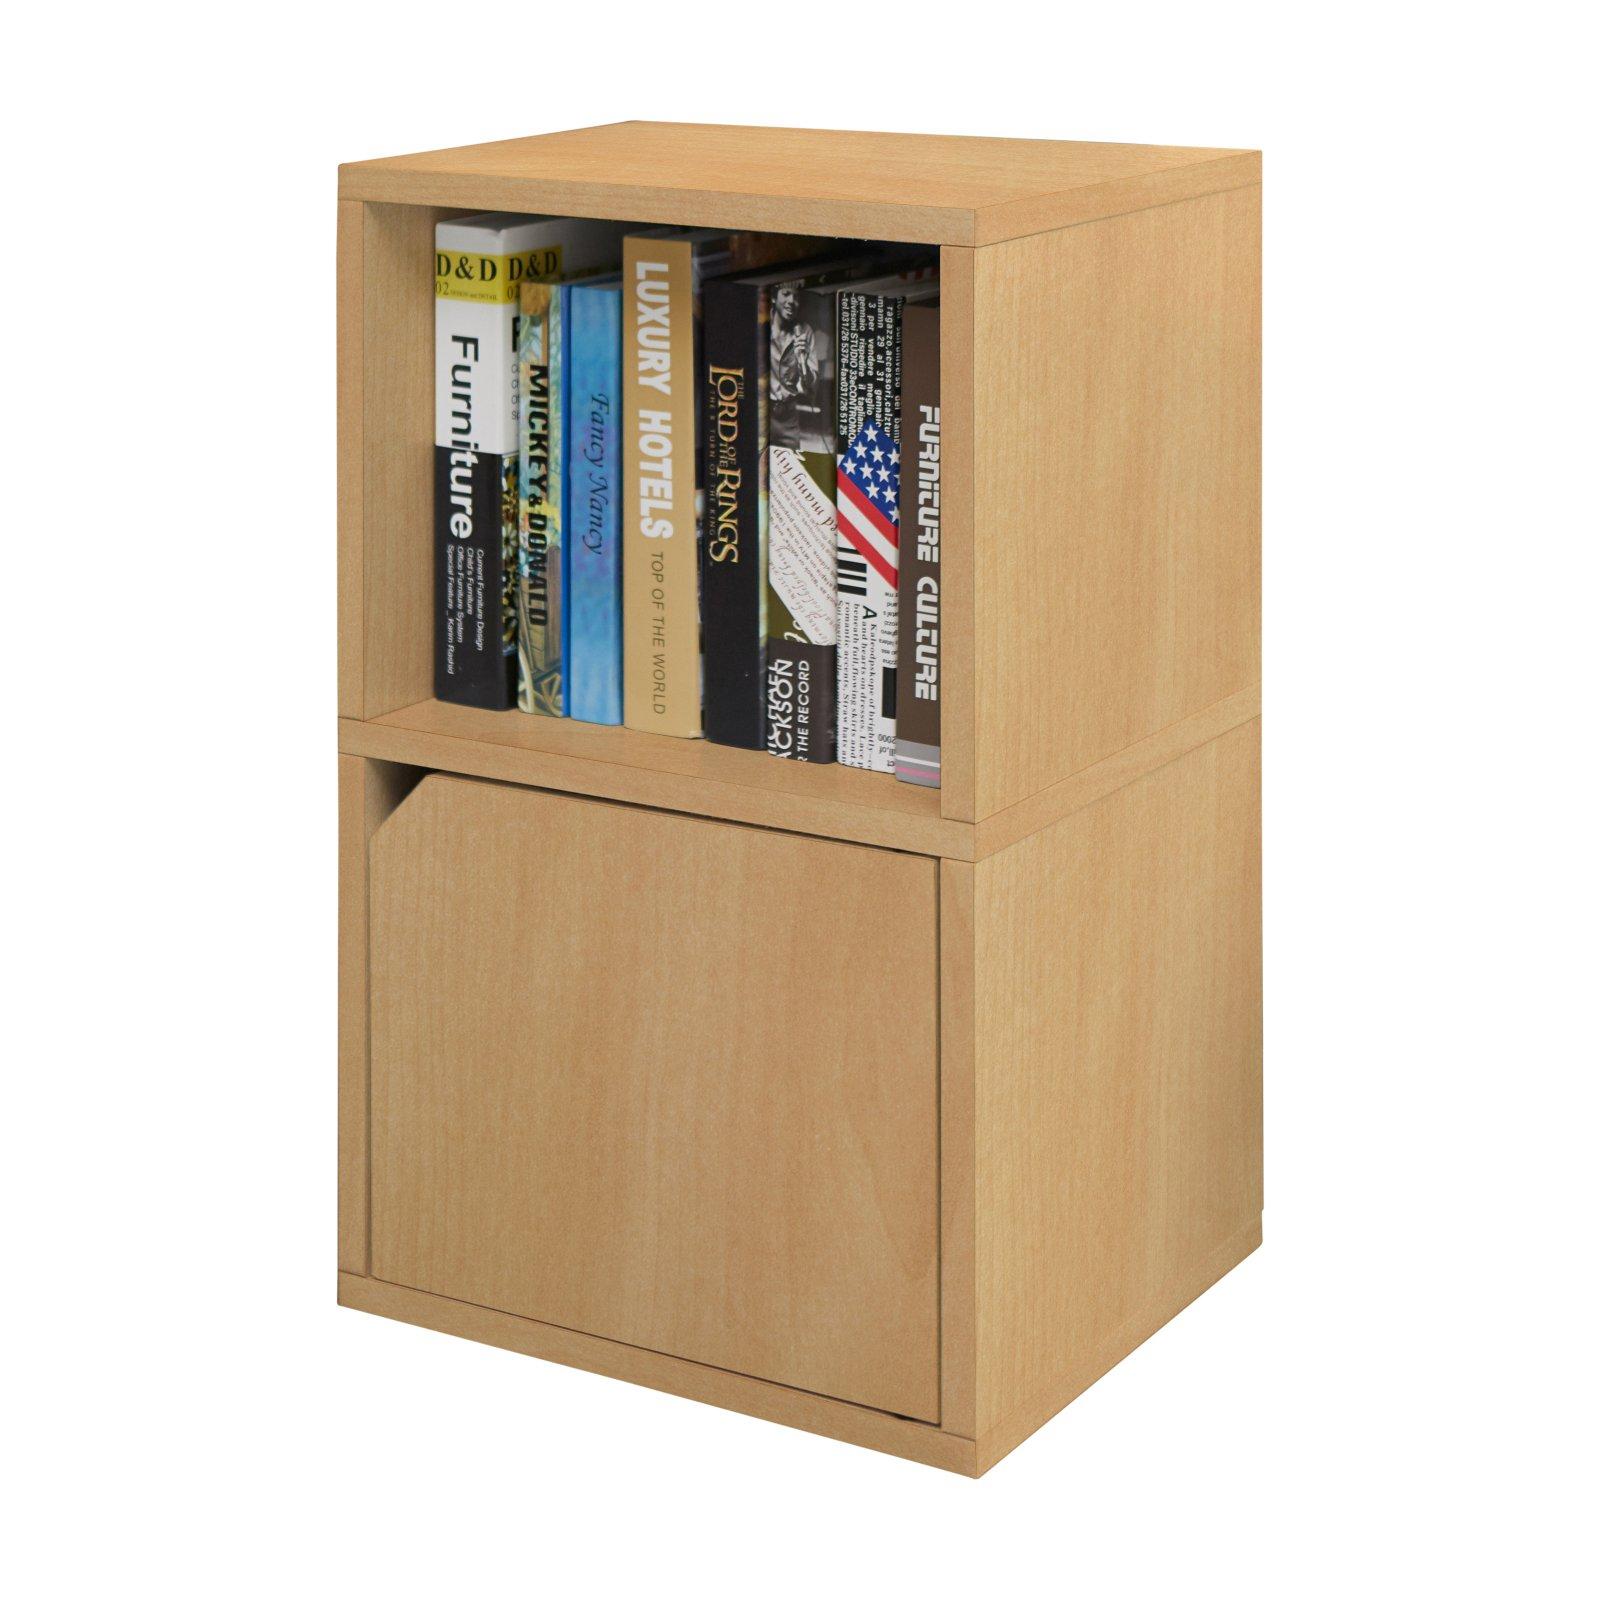 Way Basics Eco Friendly Modular Under Desk Bookcase with Door